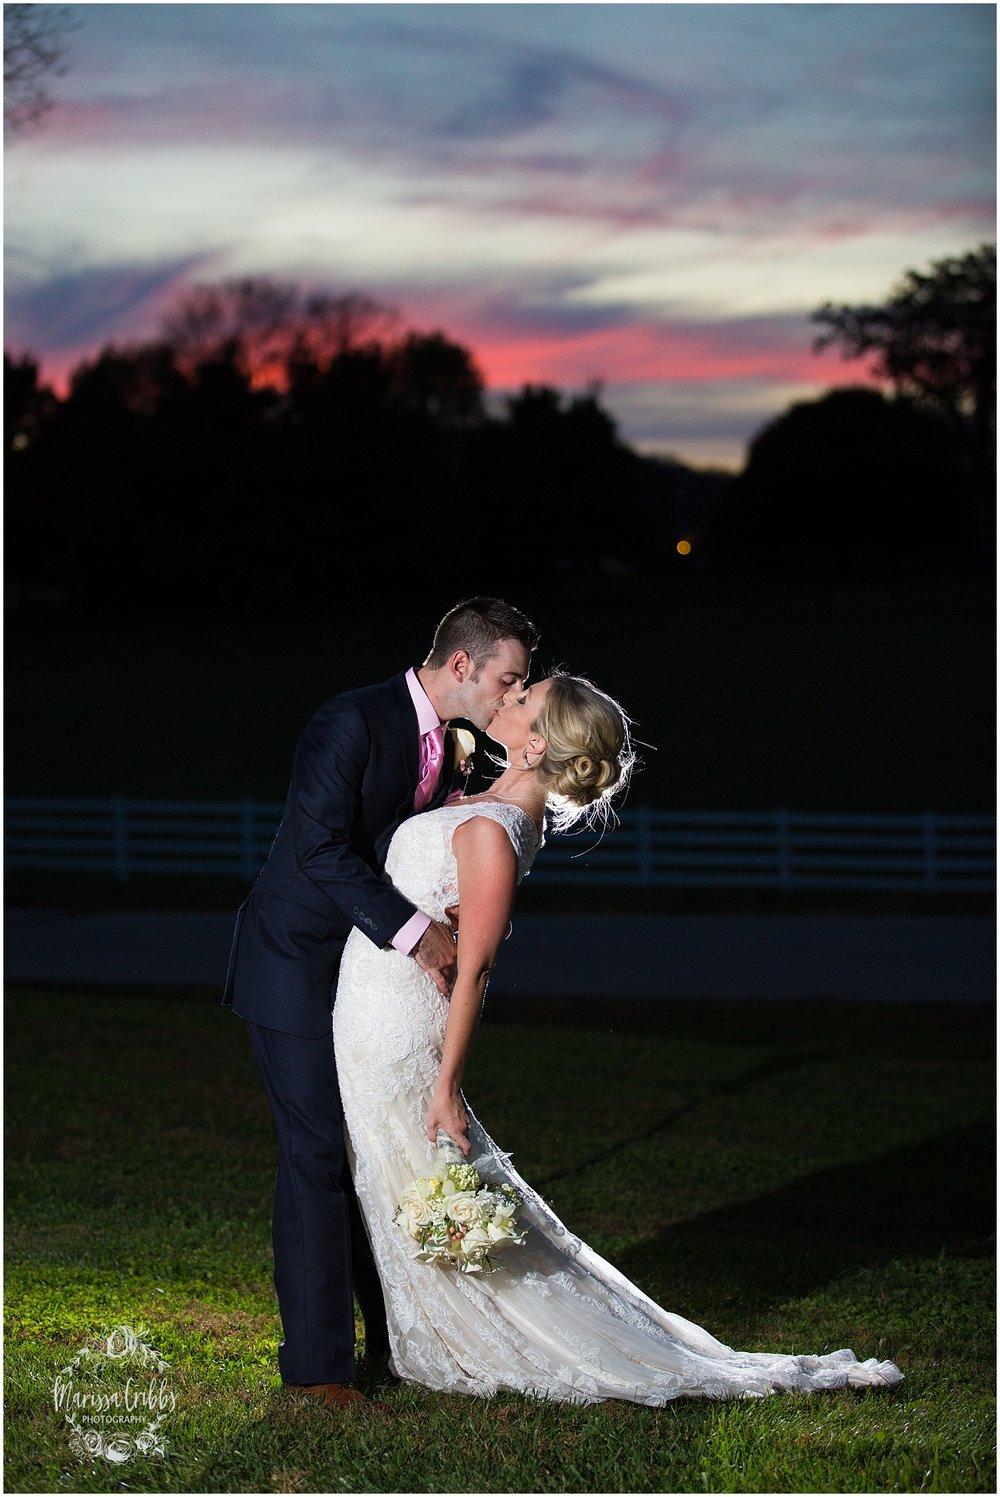 Alex & Amie | Eighteen Ninety Event Space | Marissa Cribbs Photography | Kansas City Perfect Wedding Guide_1367.jpg